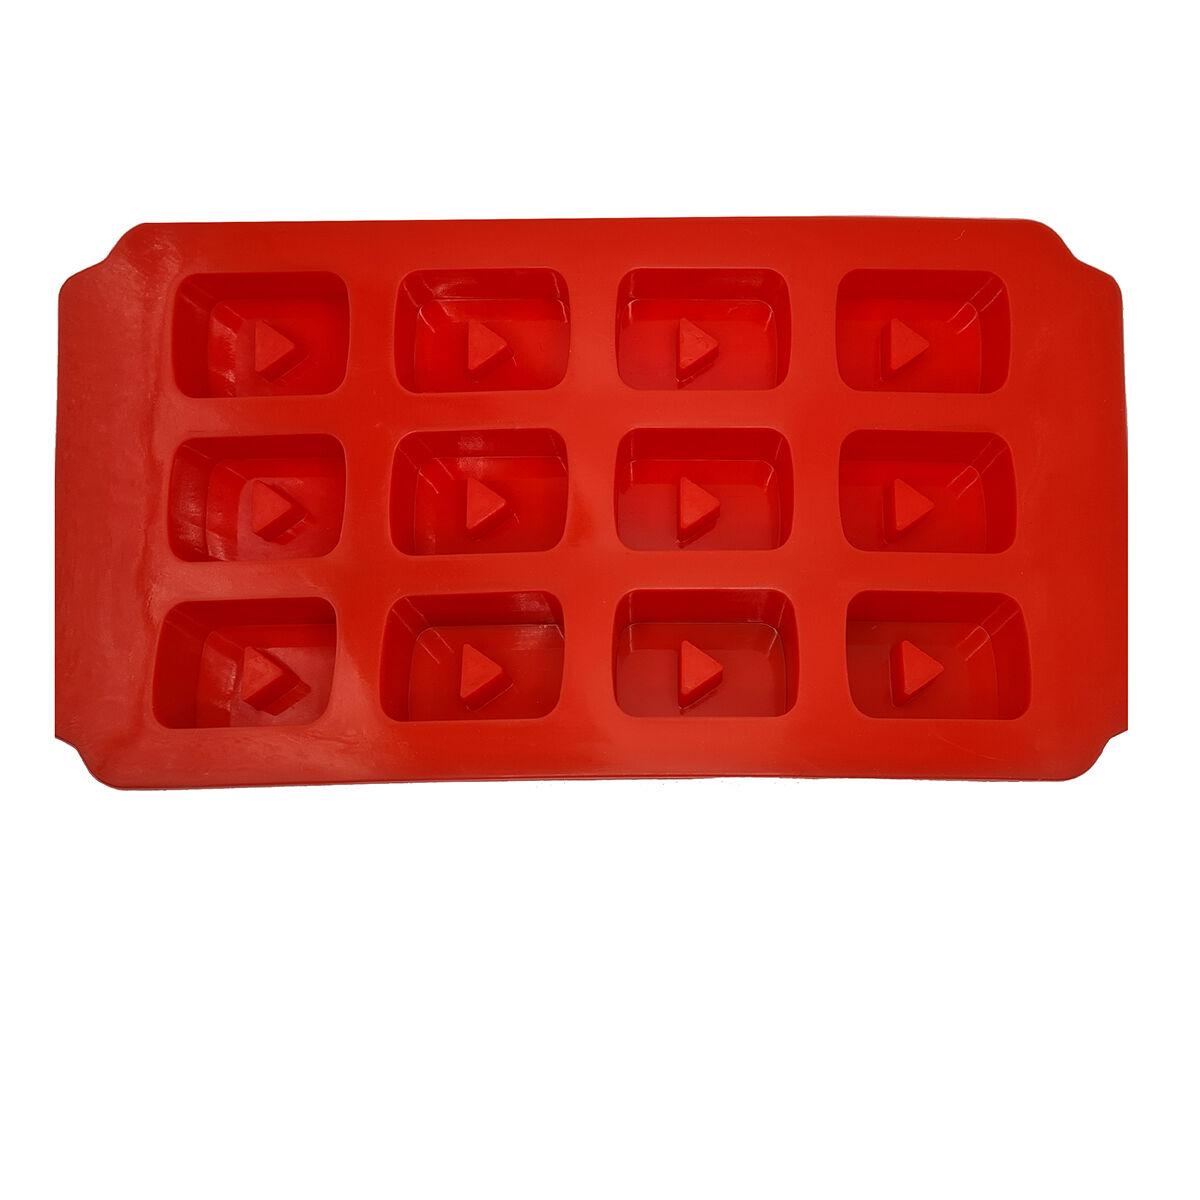 Custom Designed Ice Cube Trays